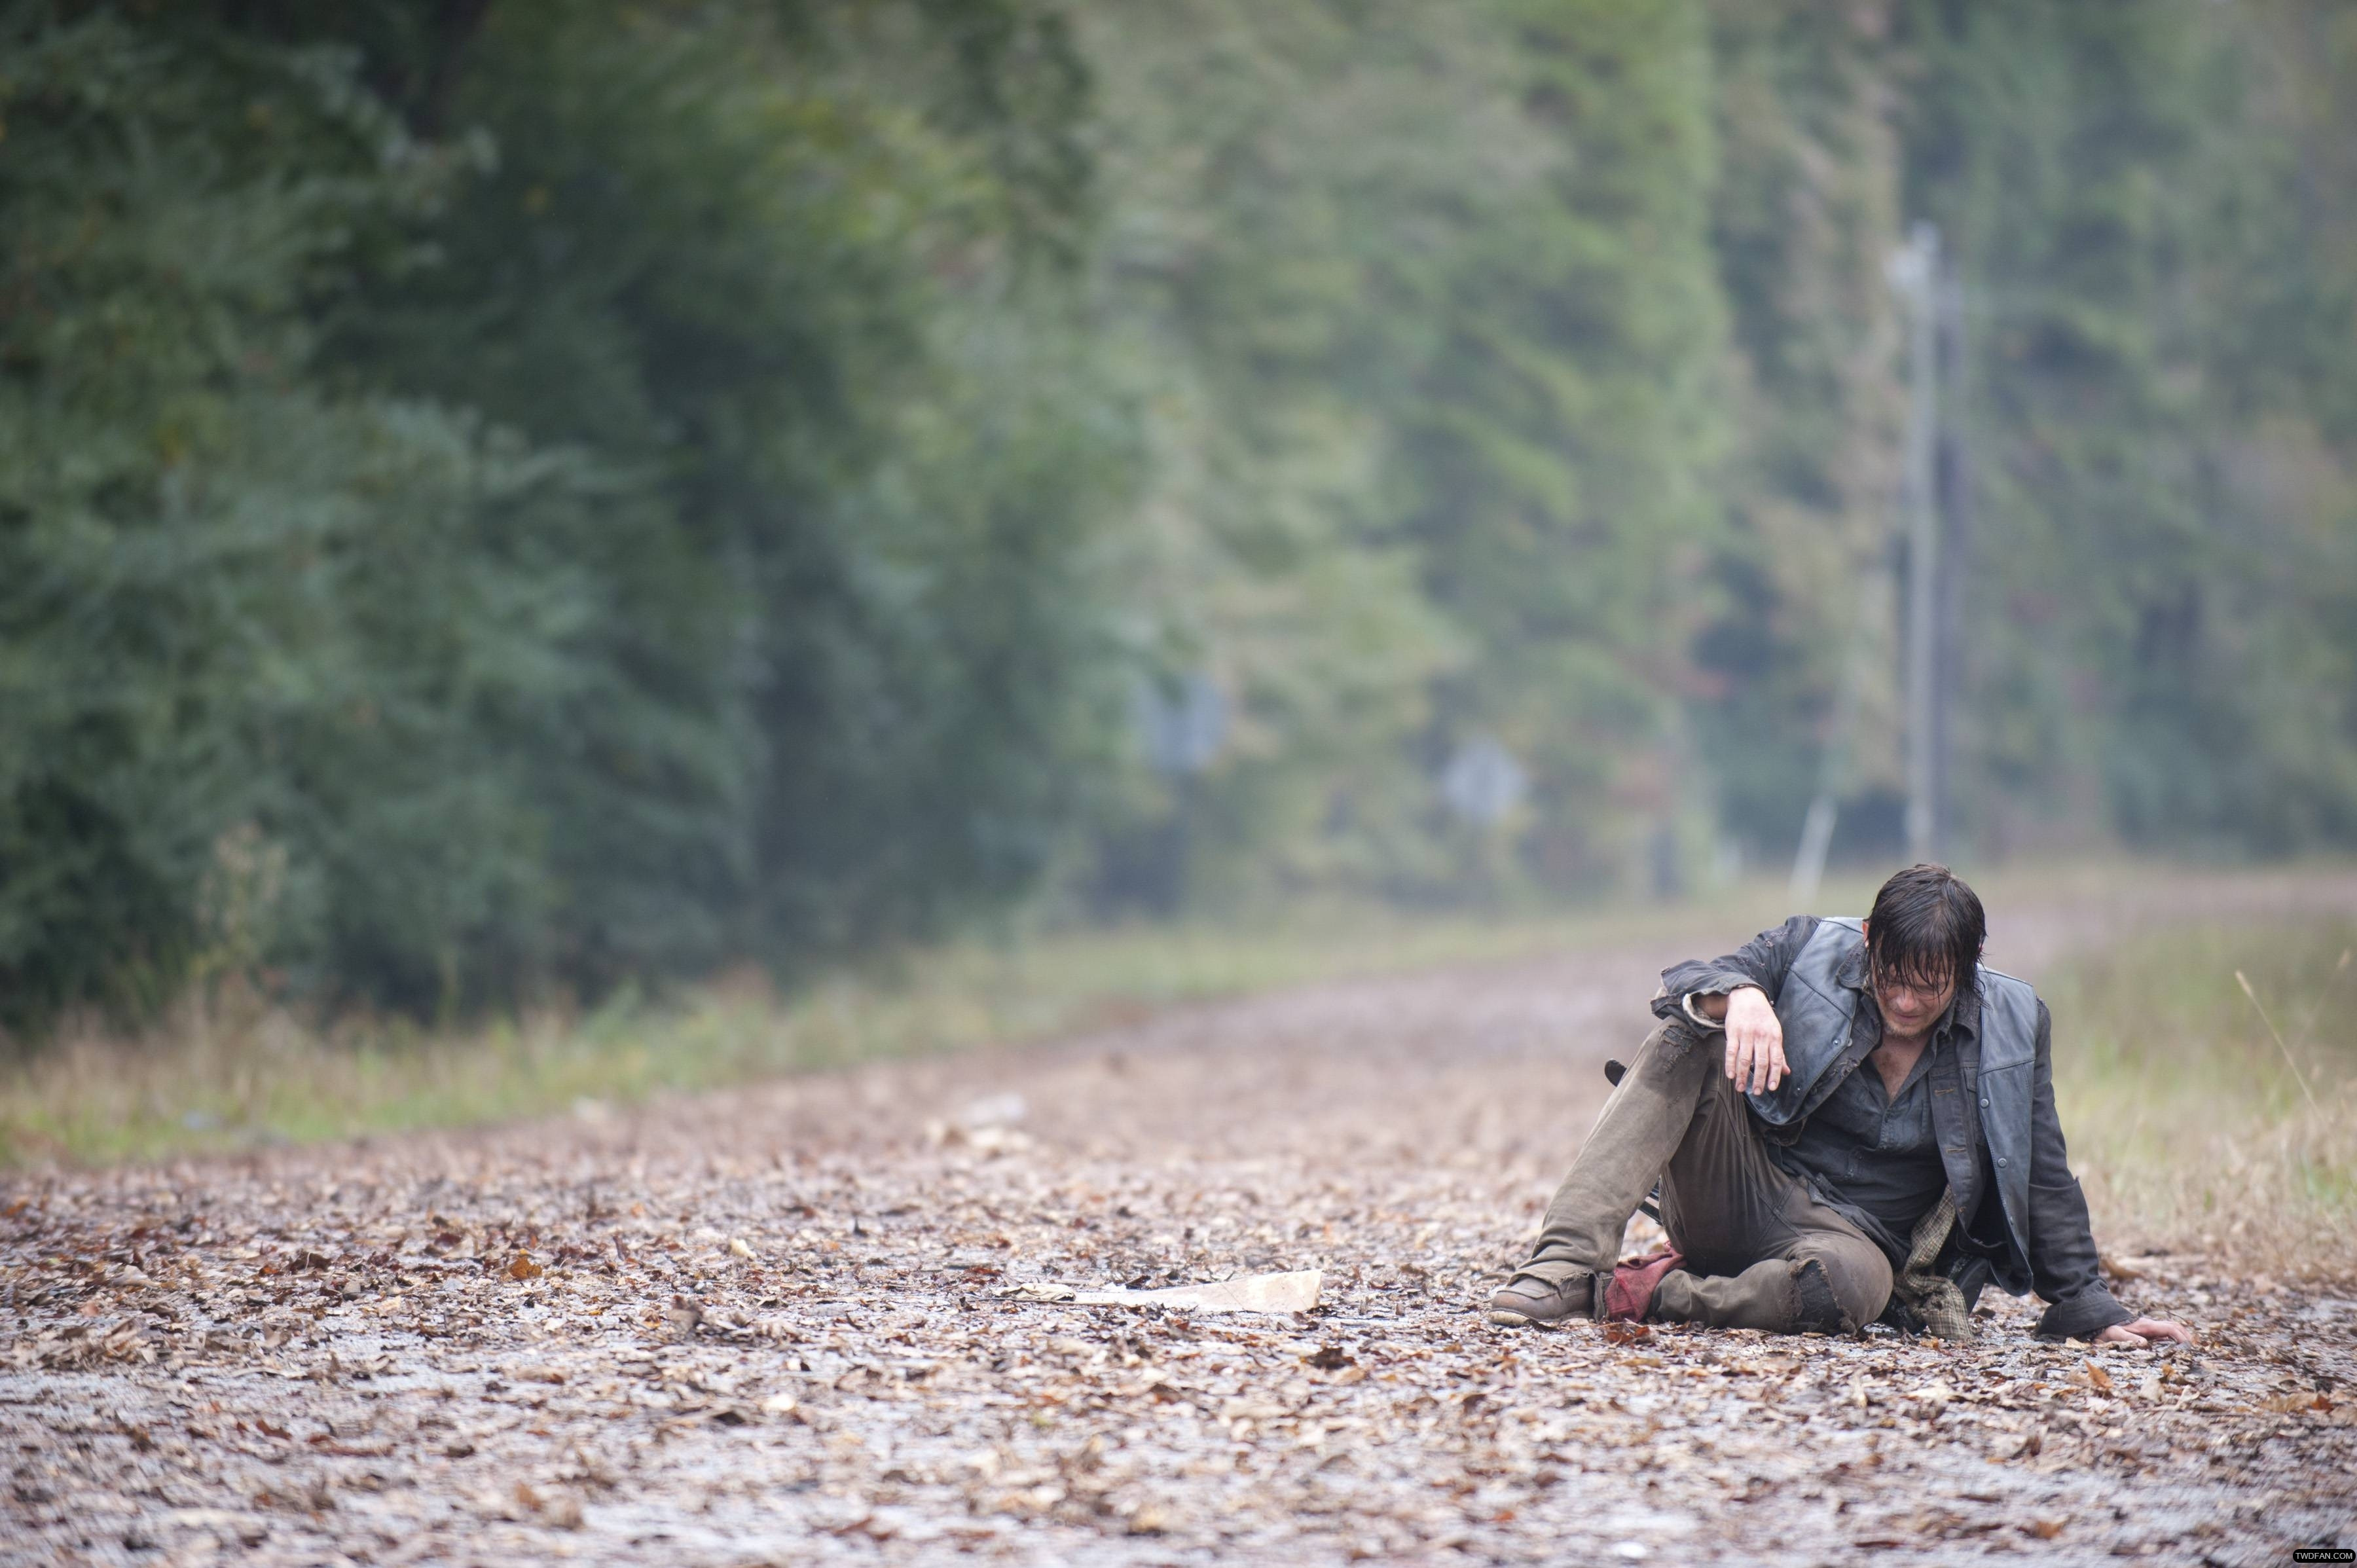 daryl-dixon-the-walking-dead-4-temporada-alone